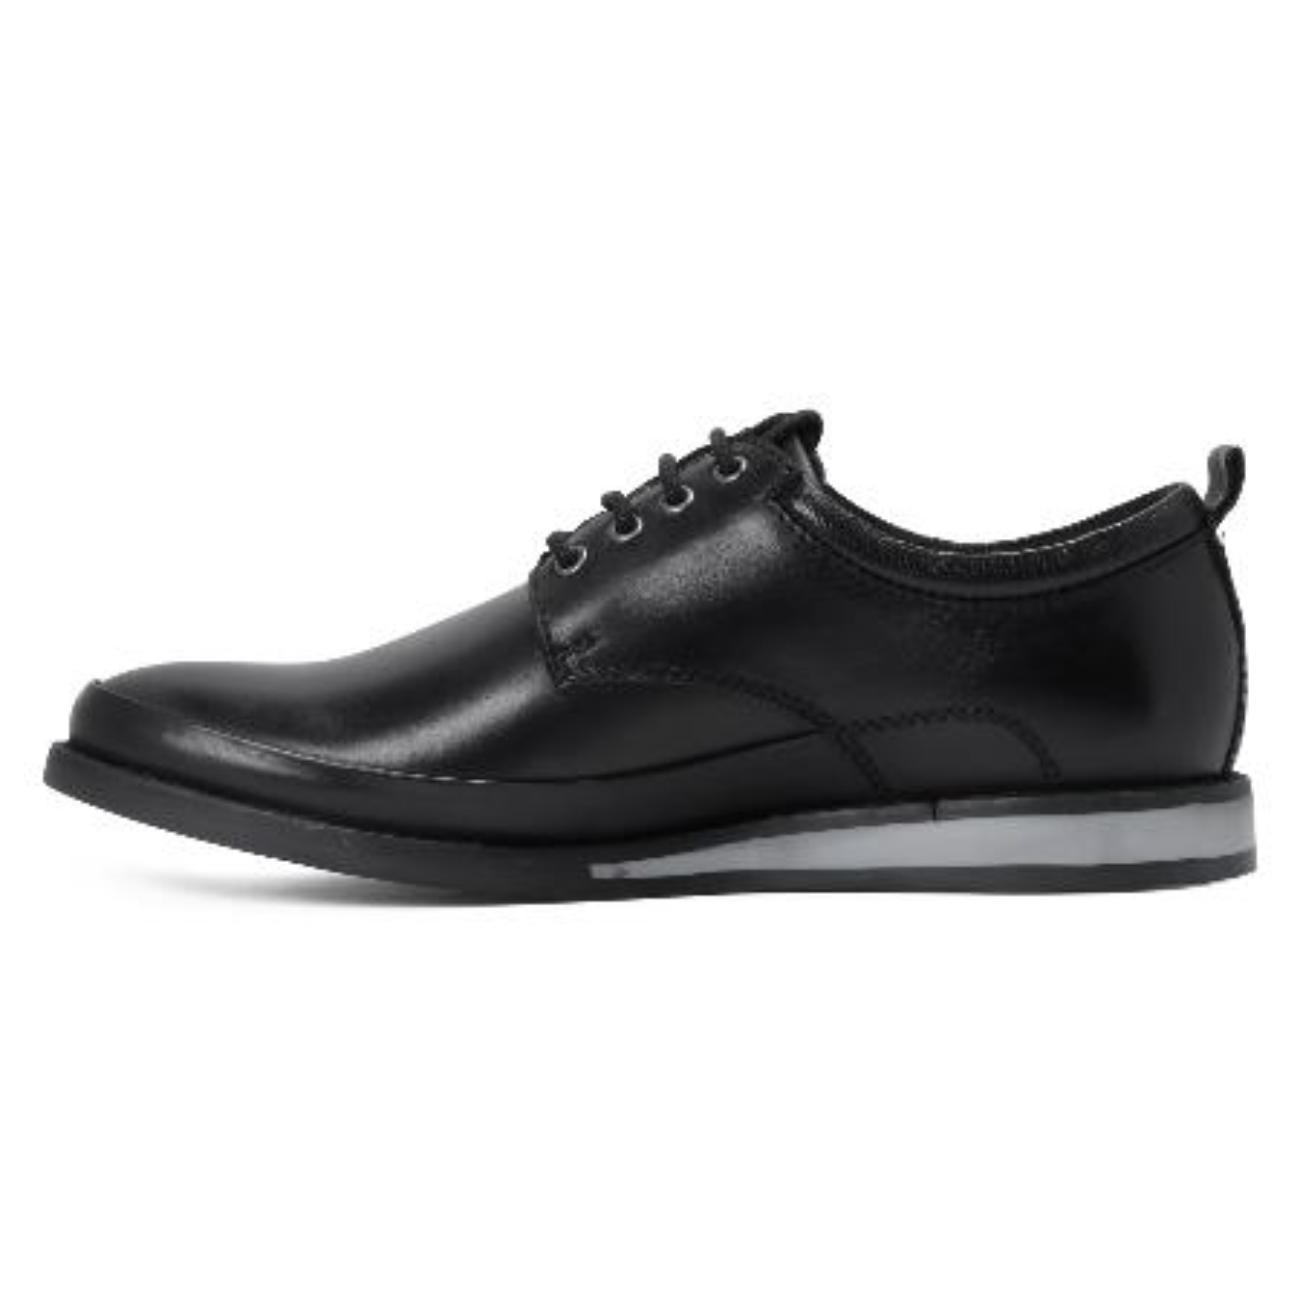 black formal shoes for men side view_2